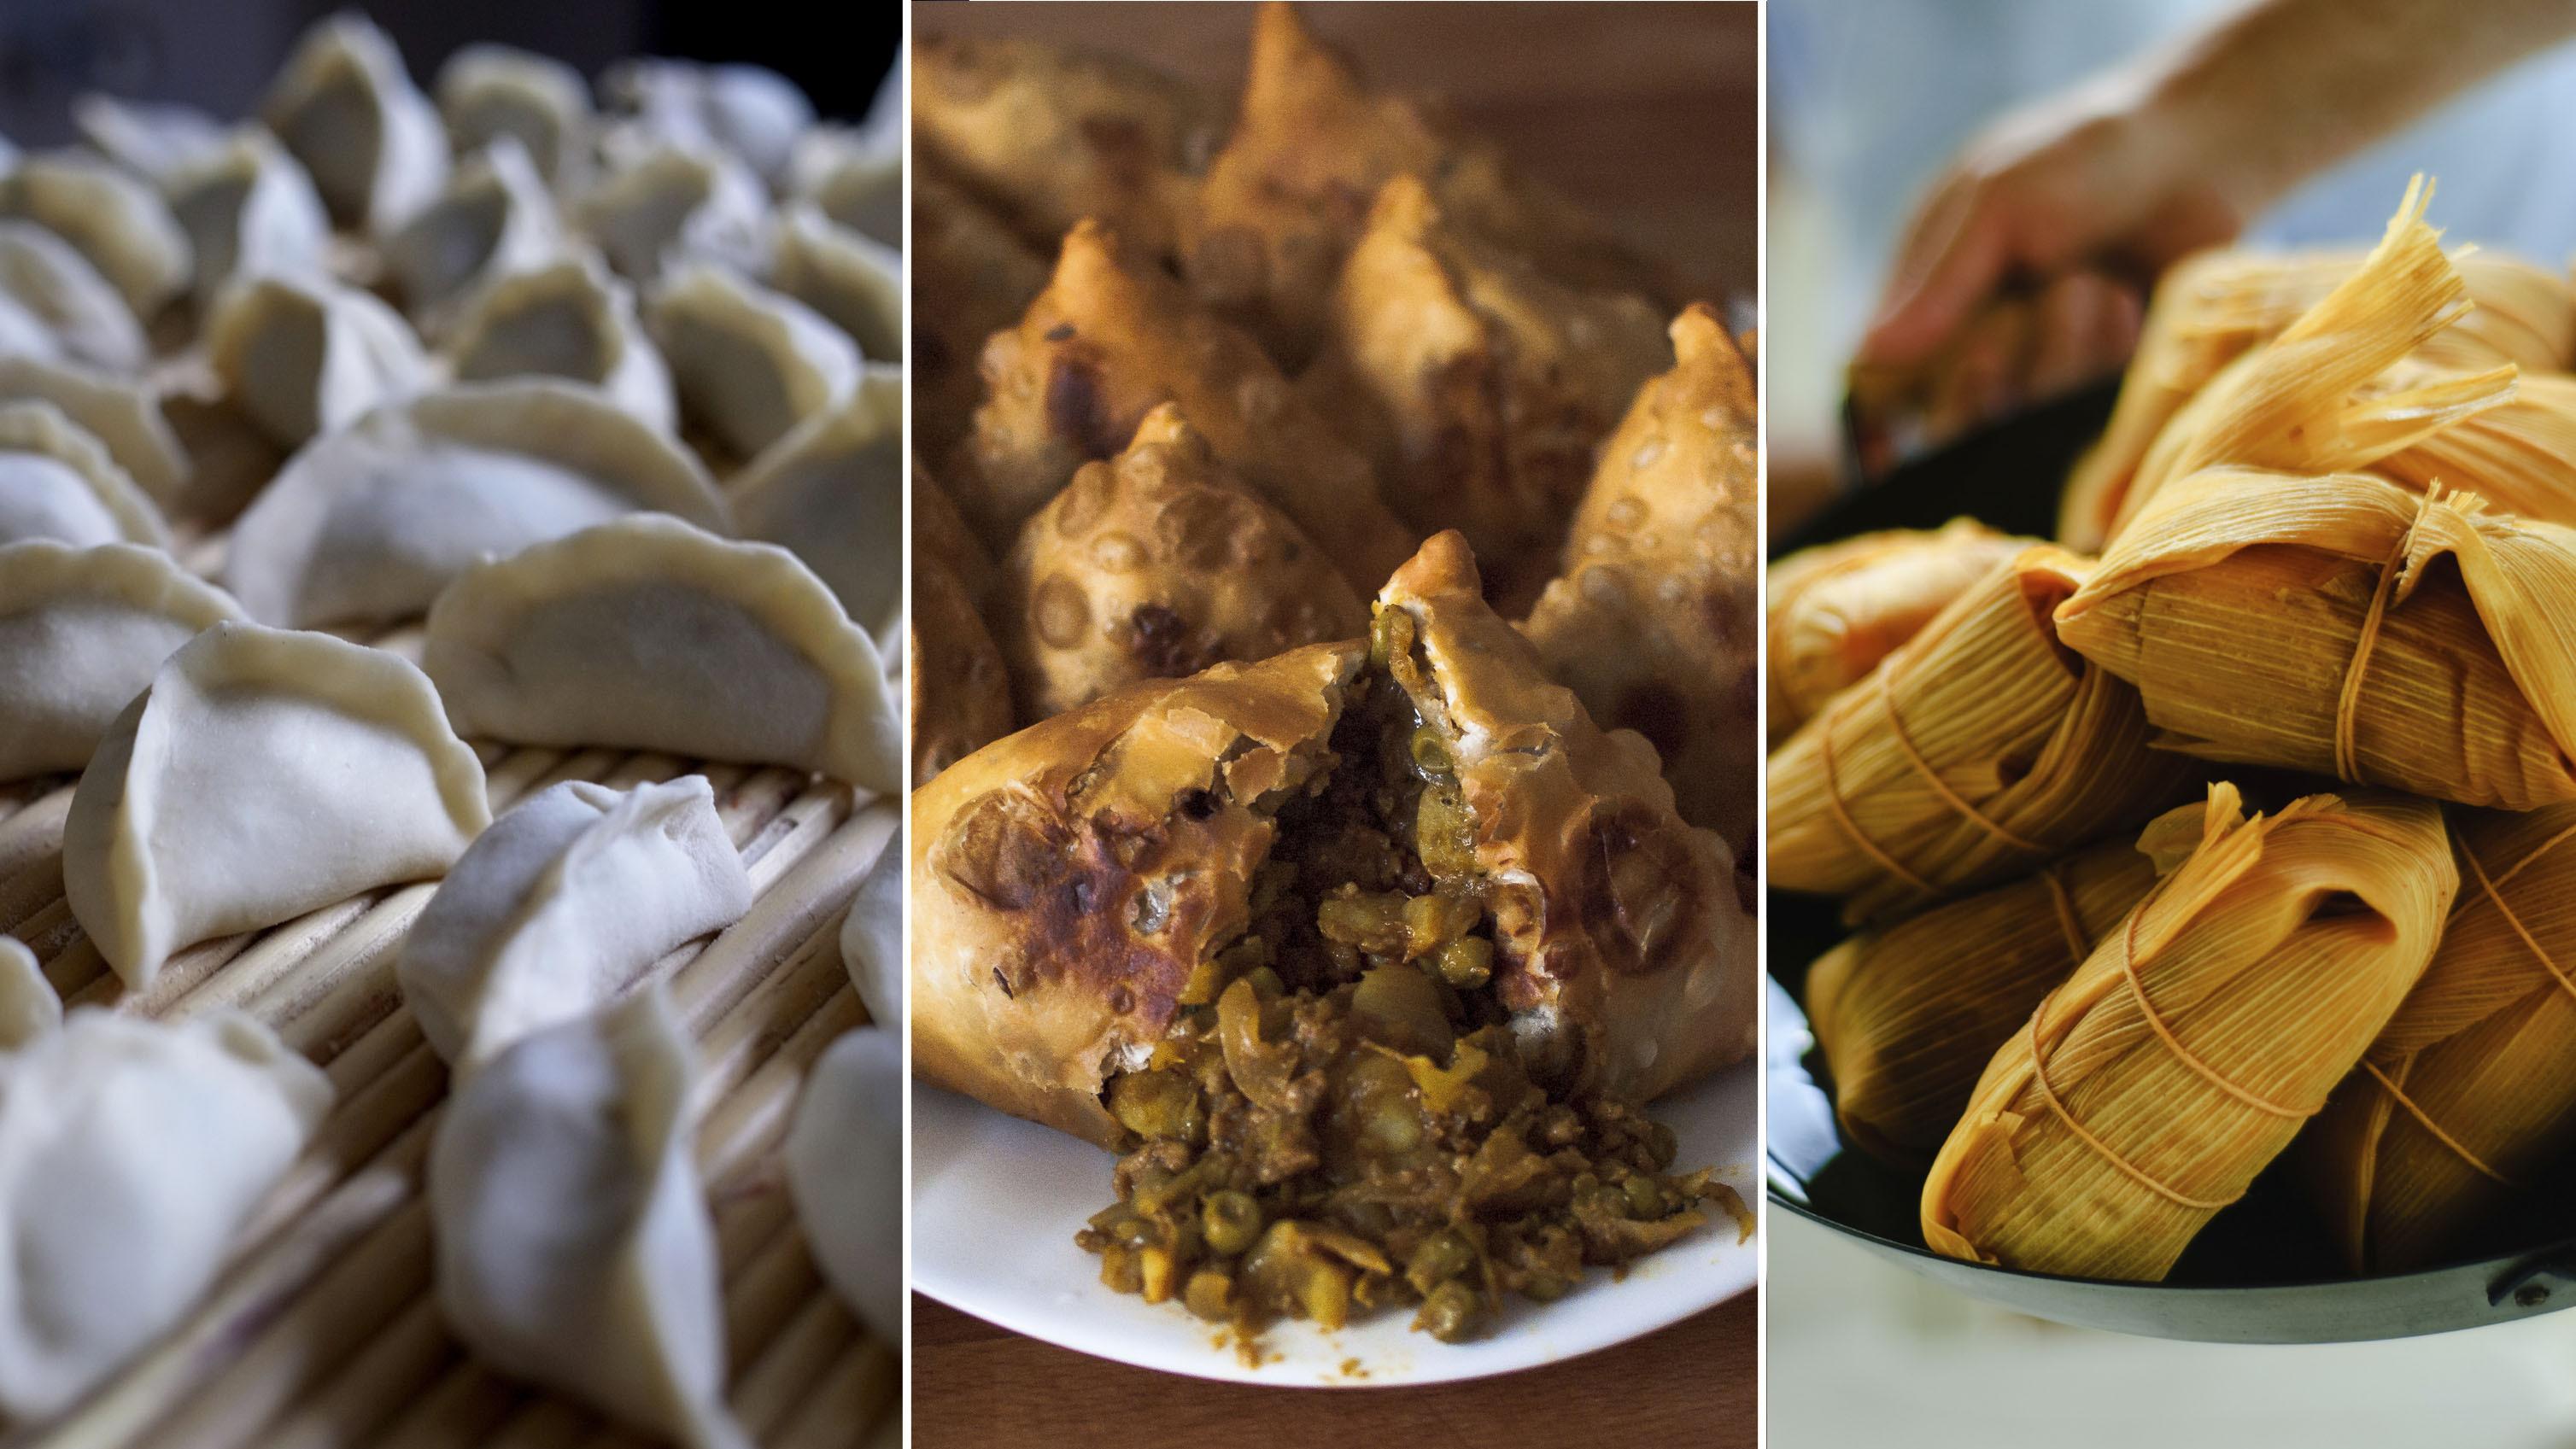 The Great Dumpling Debate: What Makes The Cut?